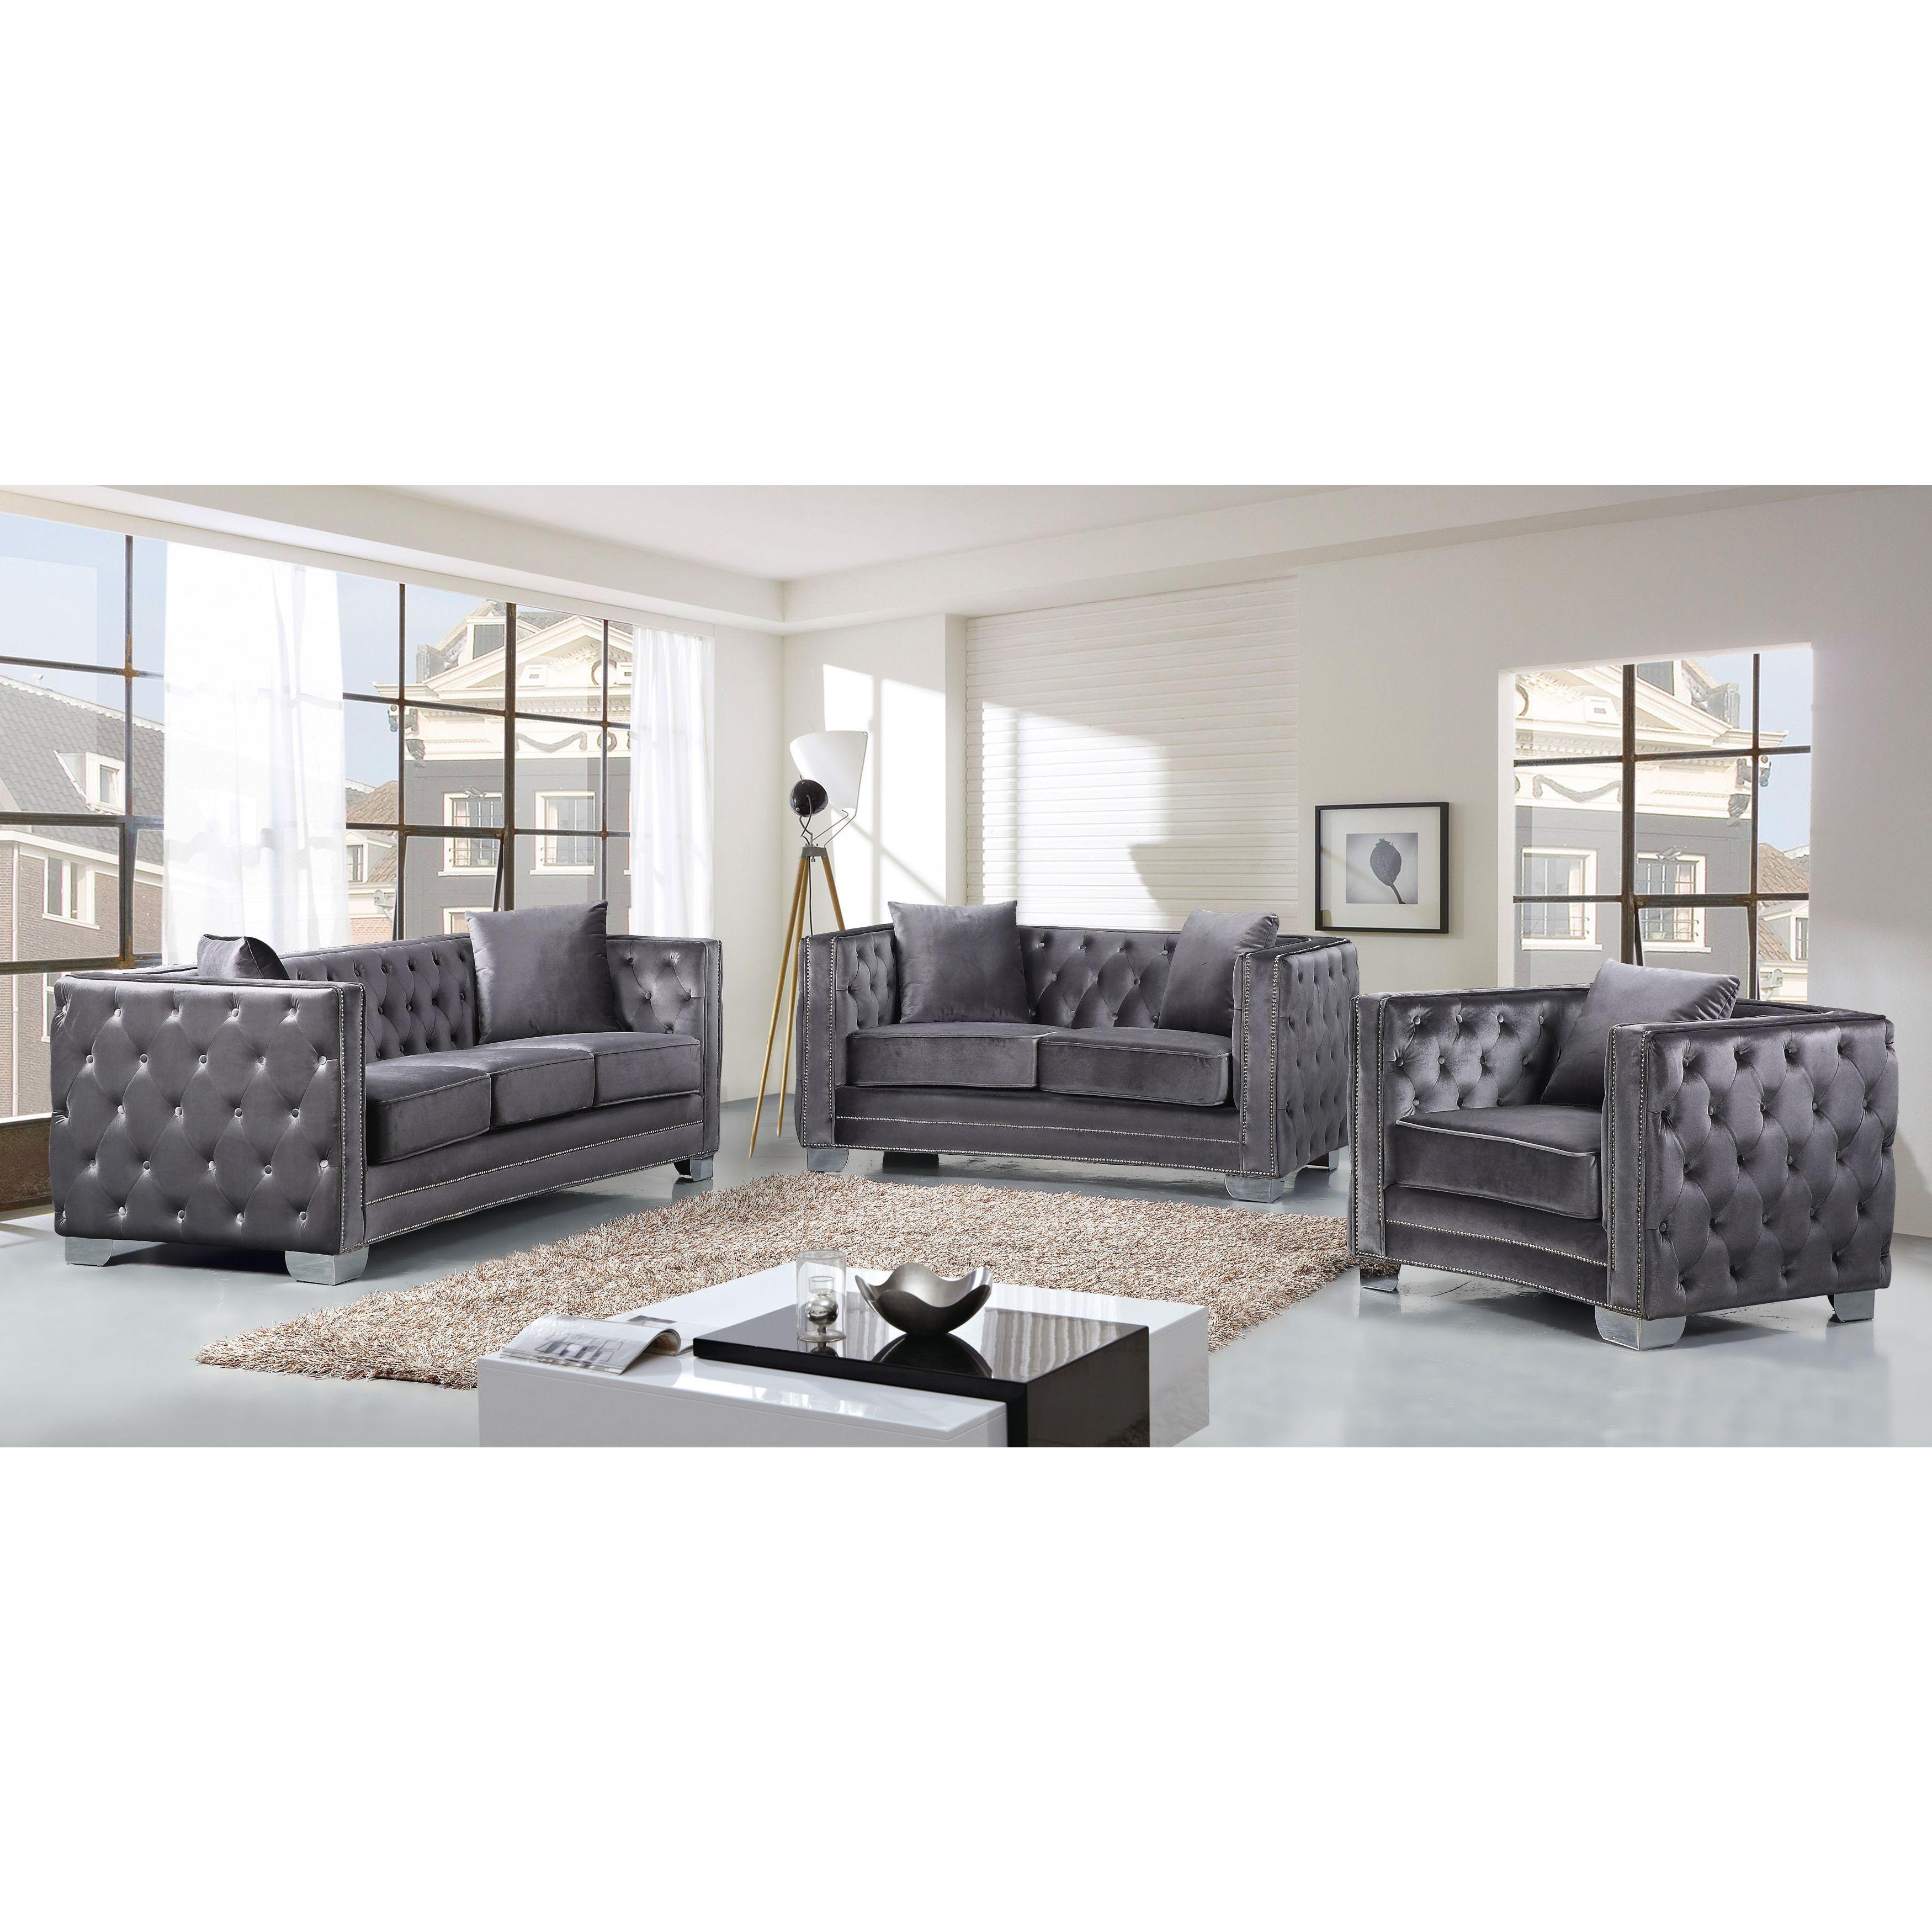 Shop Meridian Reese Grey Velvet 3-piece Furniture Set - Free ...